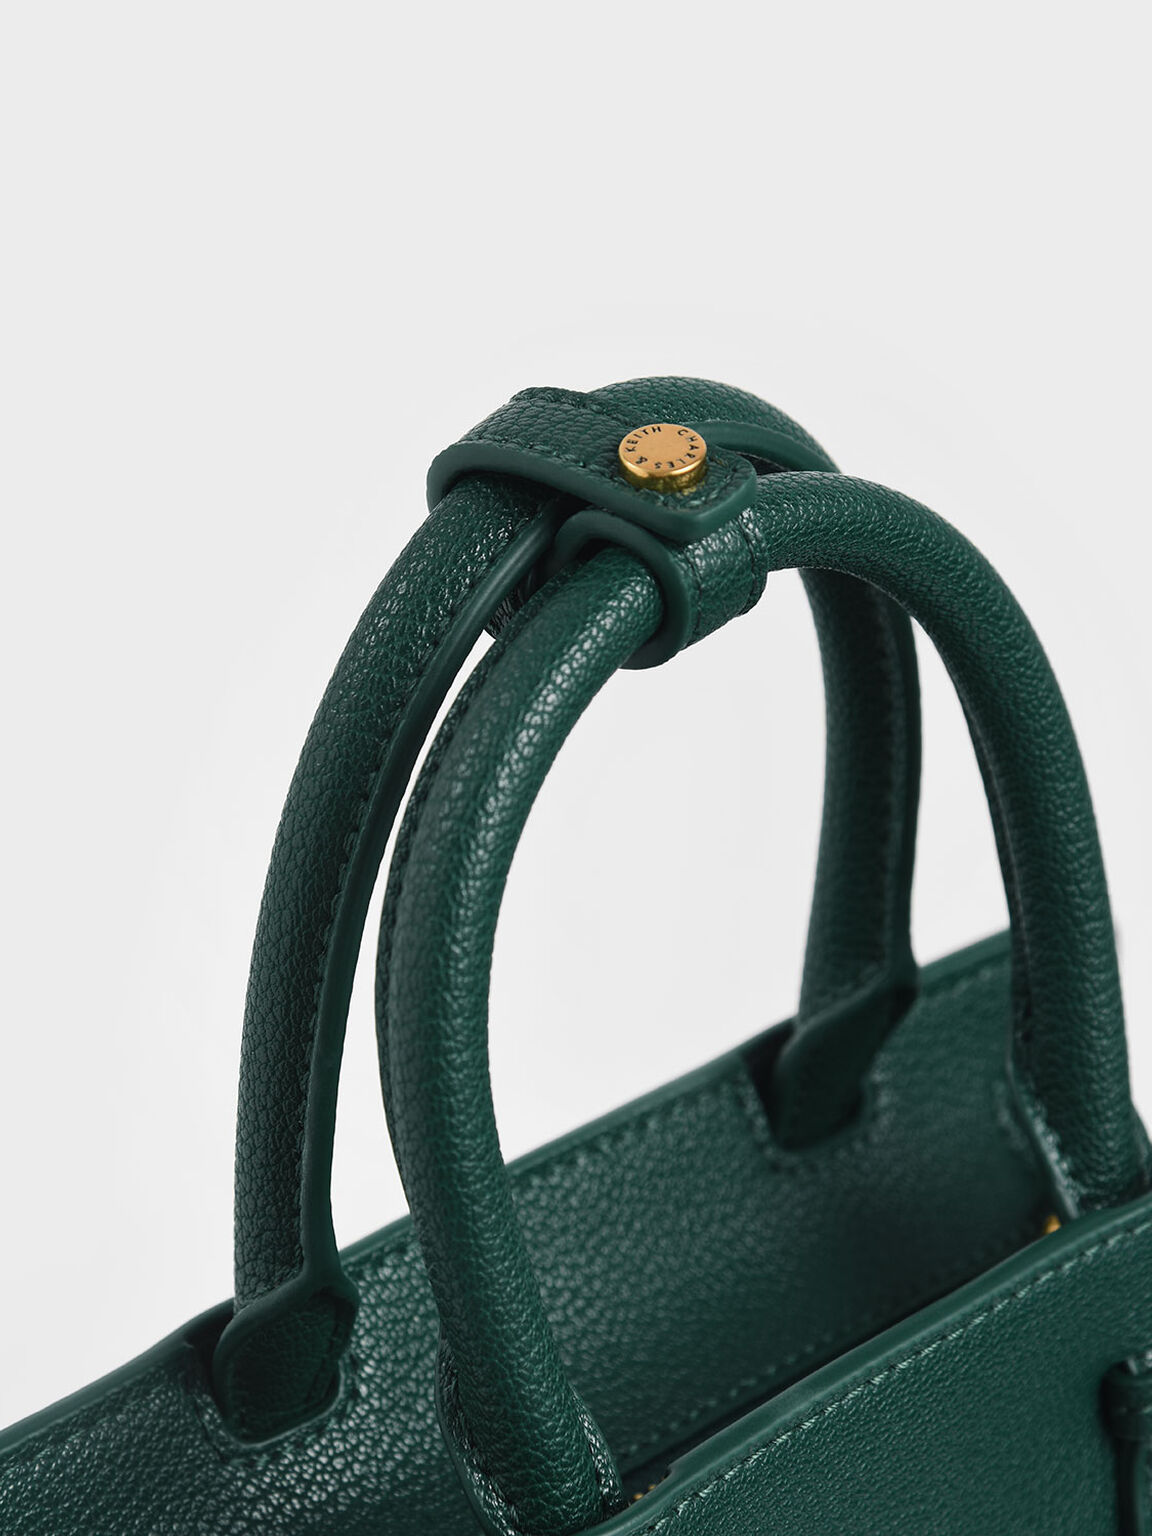 Elongated Tote Bag, Green, hi-res